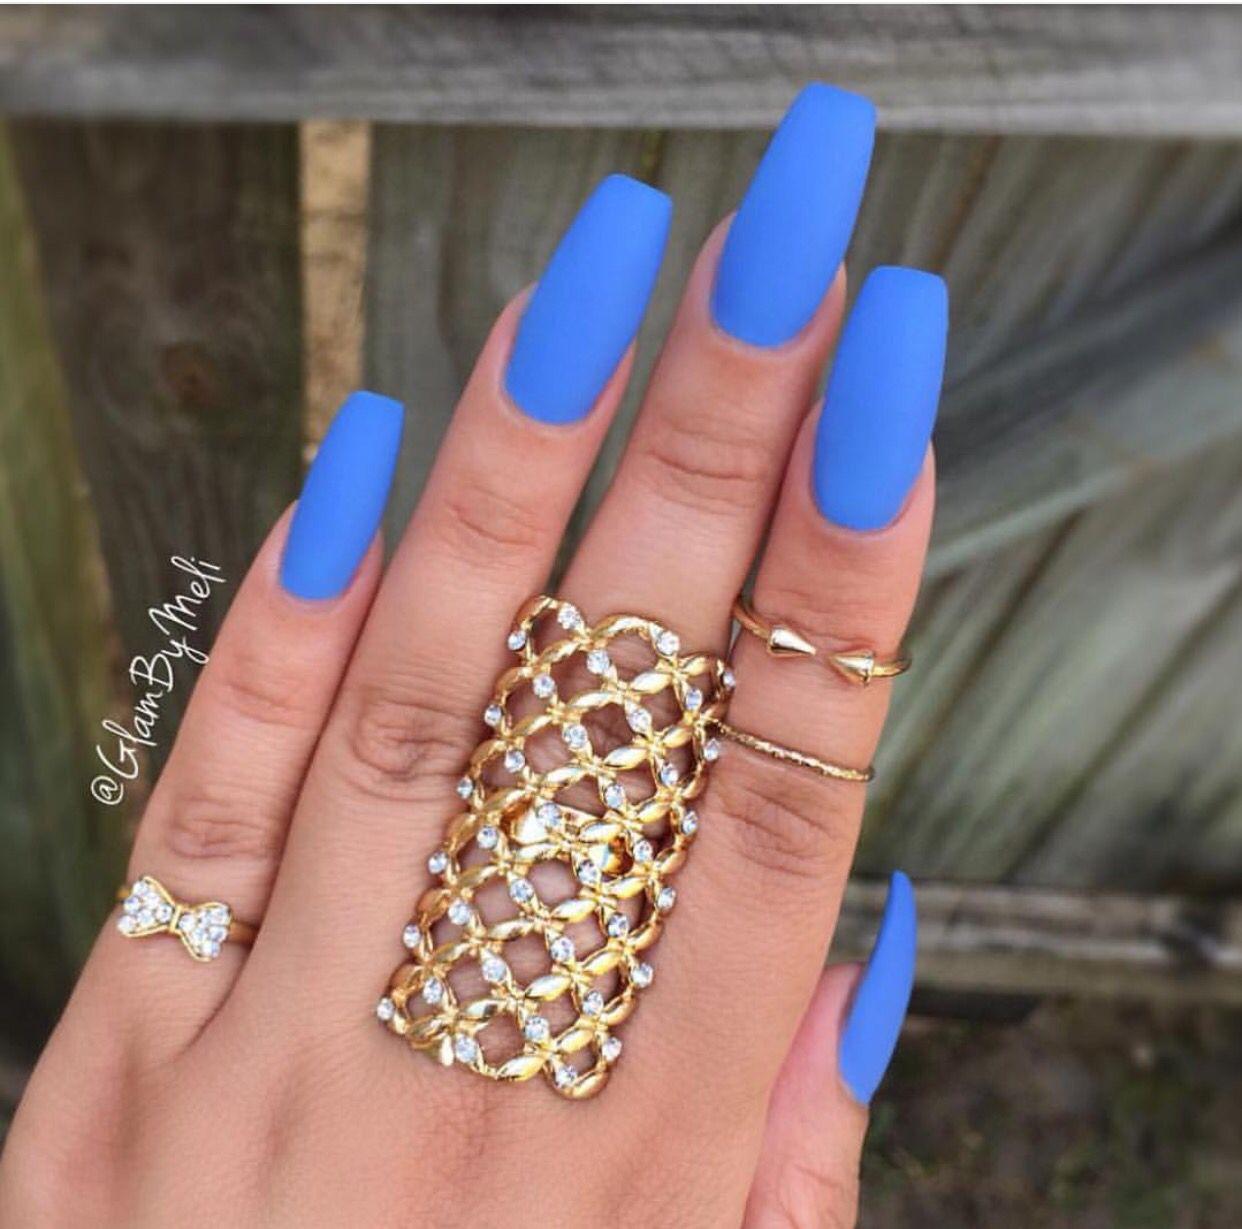 Matte light blue | Naiℓs | Pinterest | Lights, Acrylics and Nail inspo